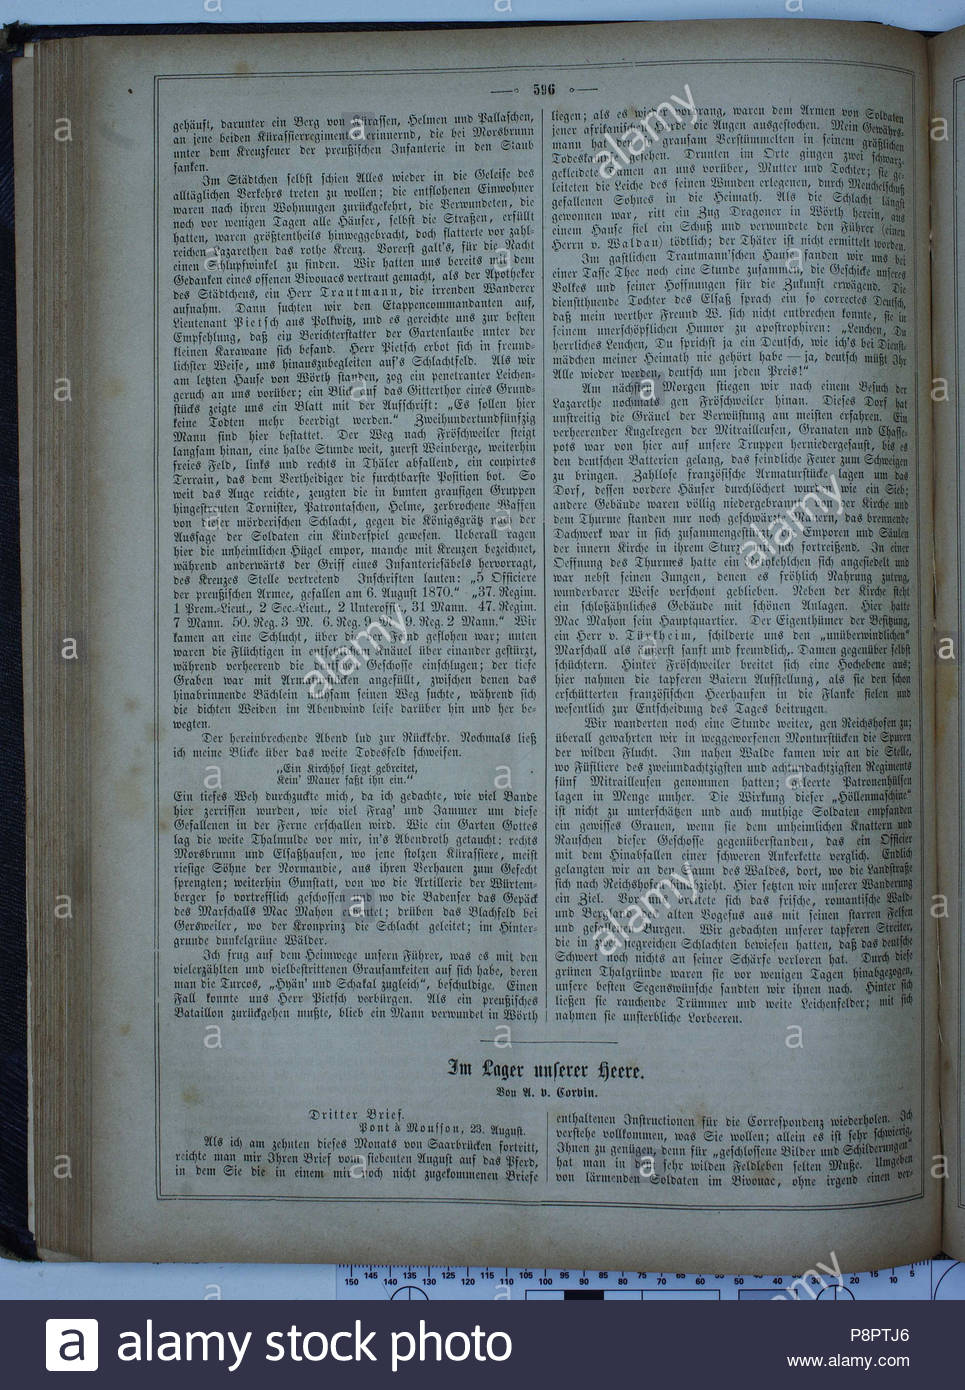 156 gartenlaube 1870 596 P8PTJ6